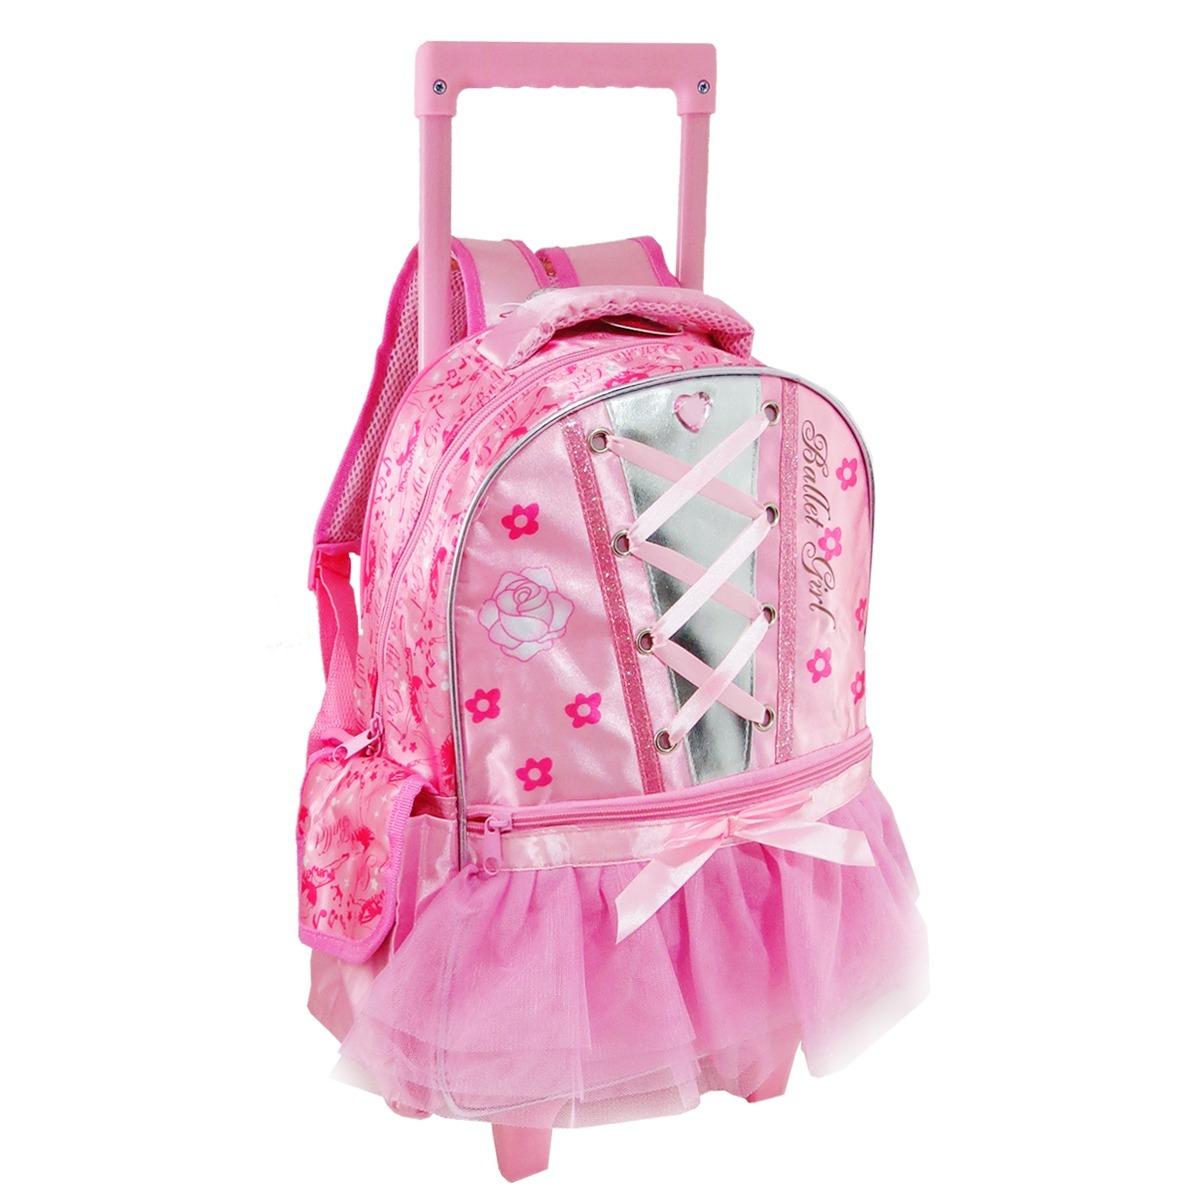 Bolsa Escolar Infantil Feminina Mercado Livre : Mochila escolar infantil feminina princesas com rodinhas